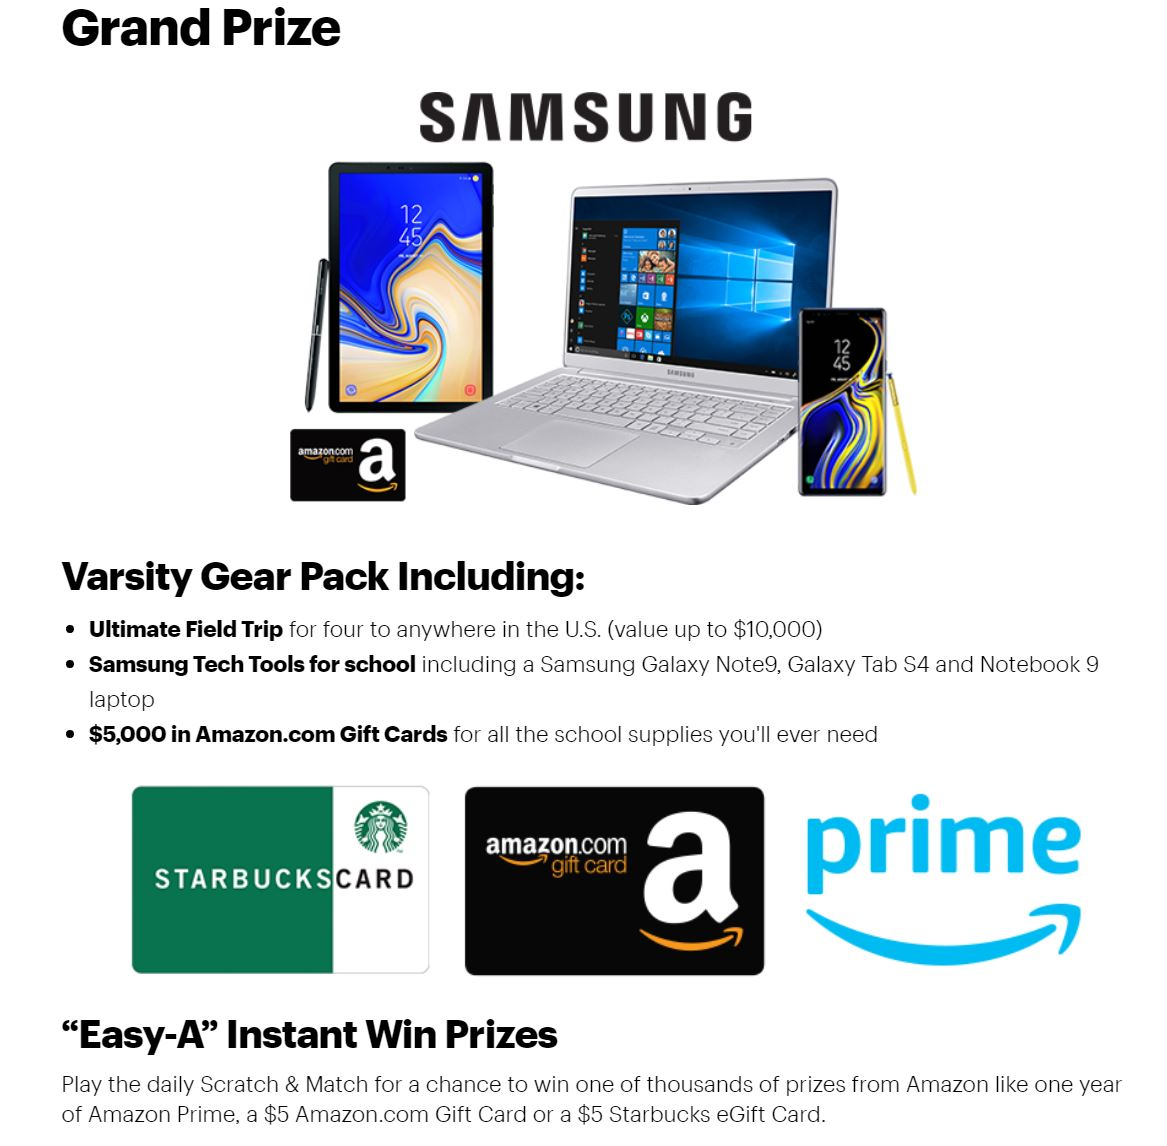 Amazon Spirit Instant Win Giveaway - 5,051 Winners  Win $5